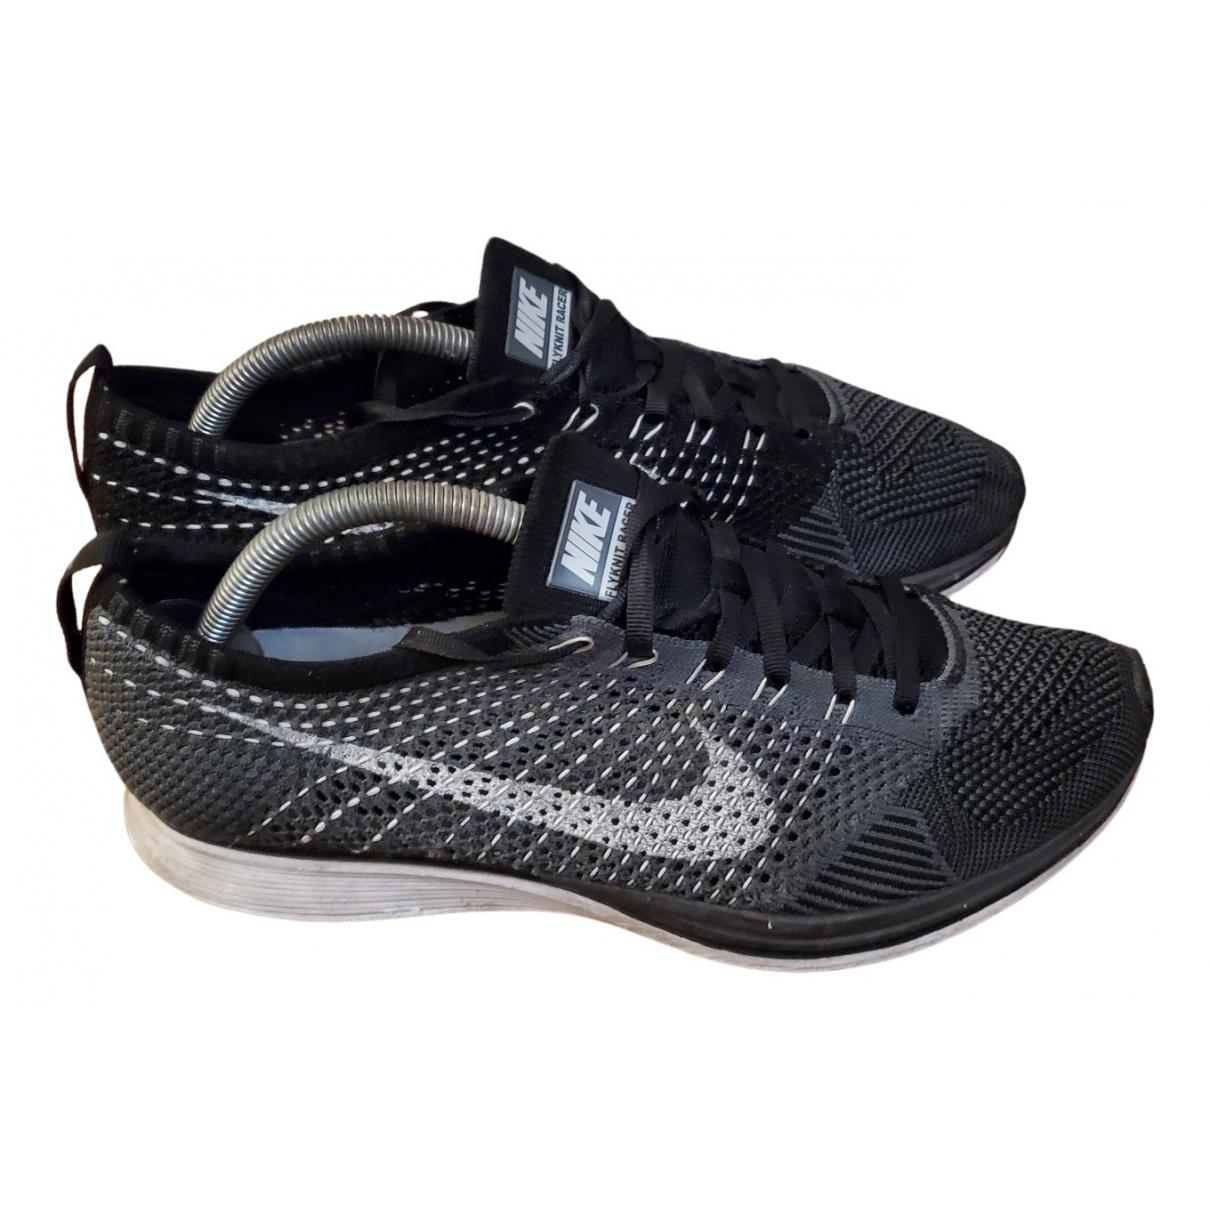 Nike - Baskets Flyknit Racer pour homme en toile - gris